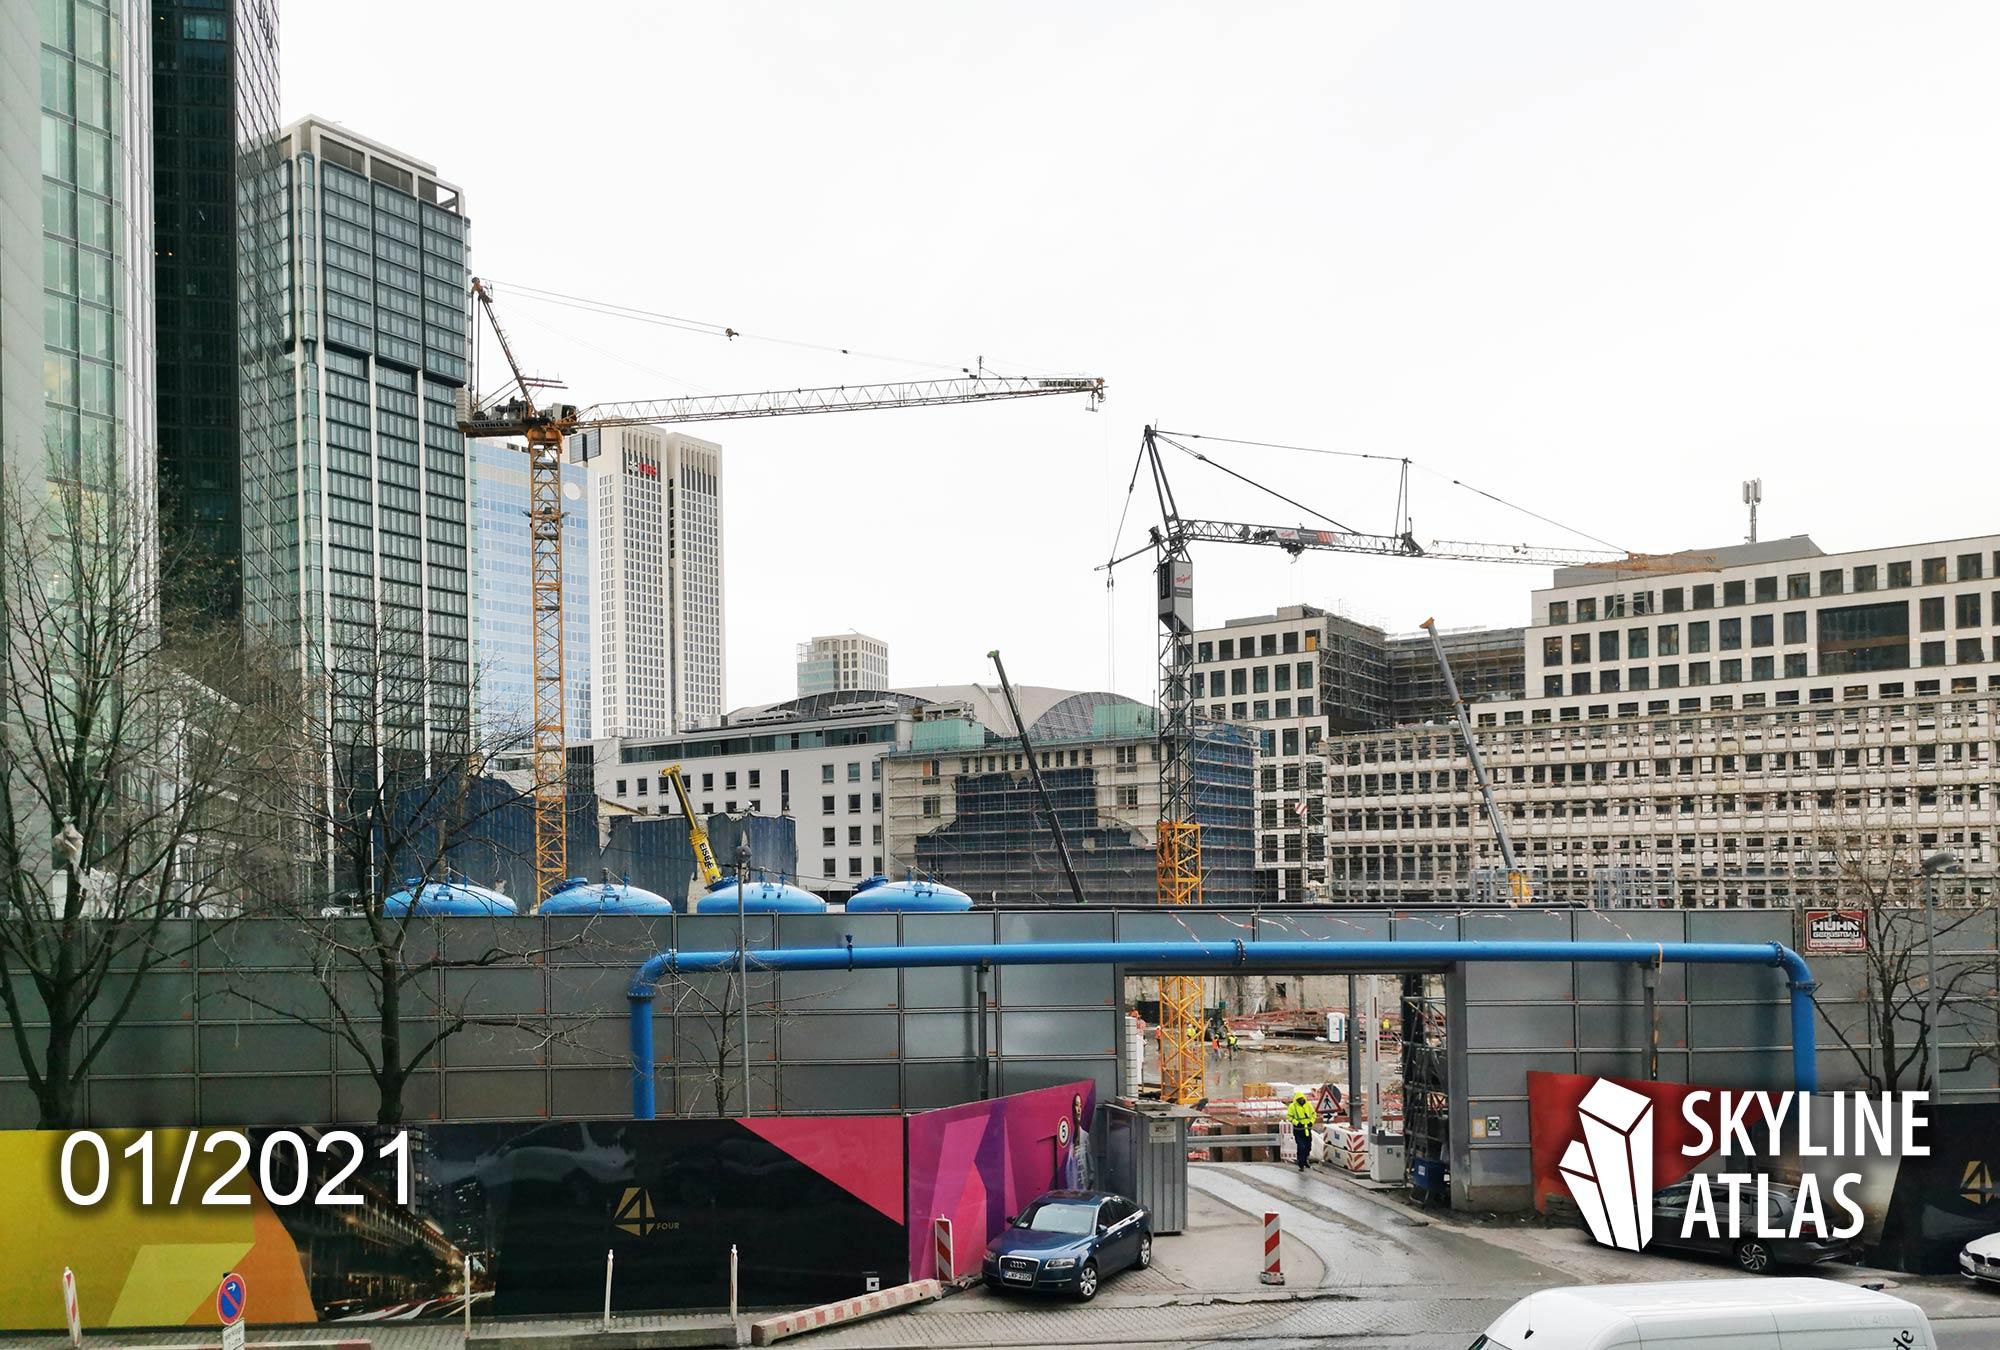 Frankfurt Four Baustelle - For Frankfurt am Main - Bankenviertel Wolkenkratzer - Four Baustelle Januar 2021